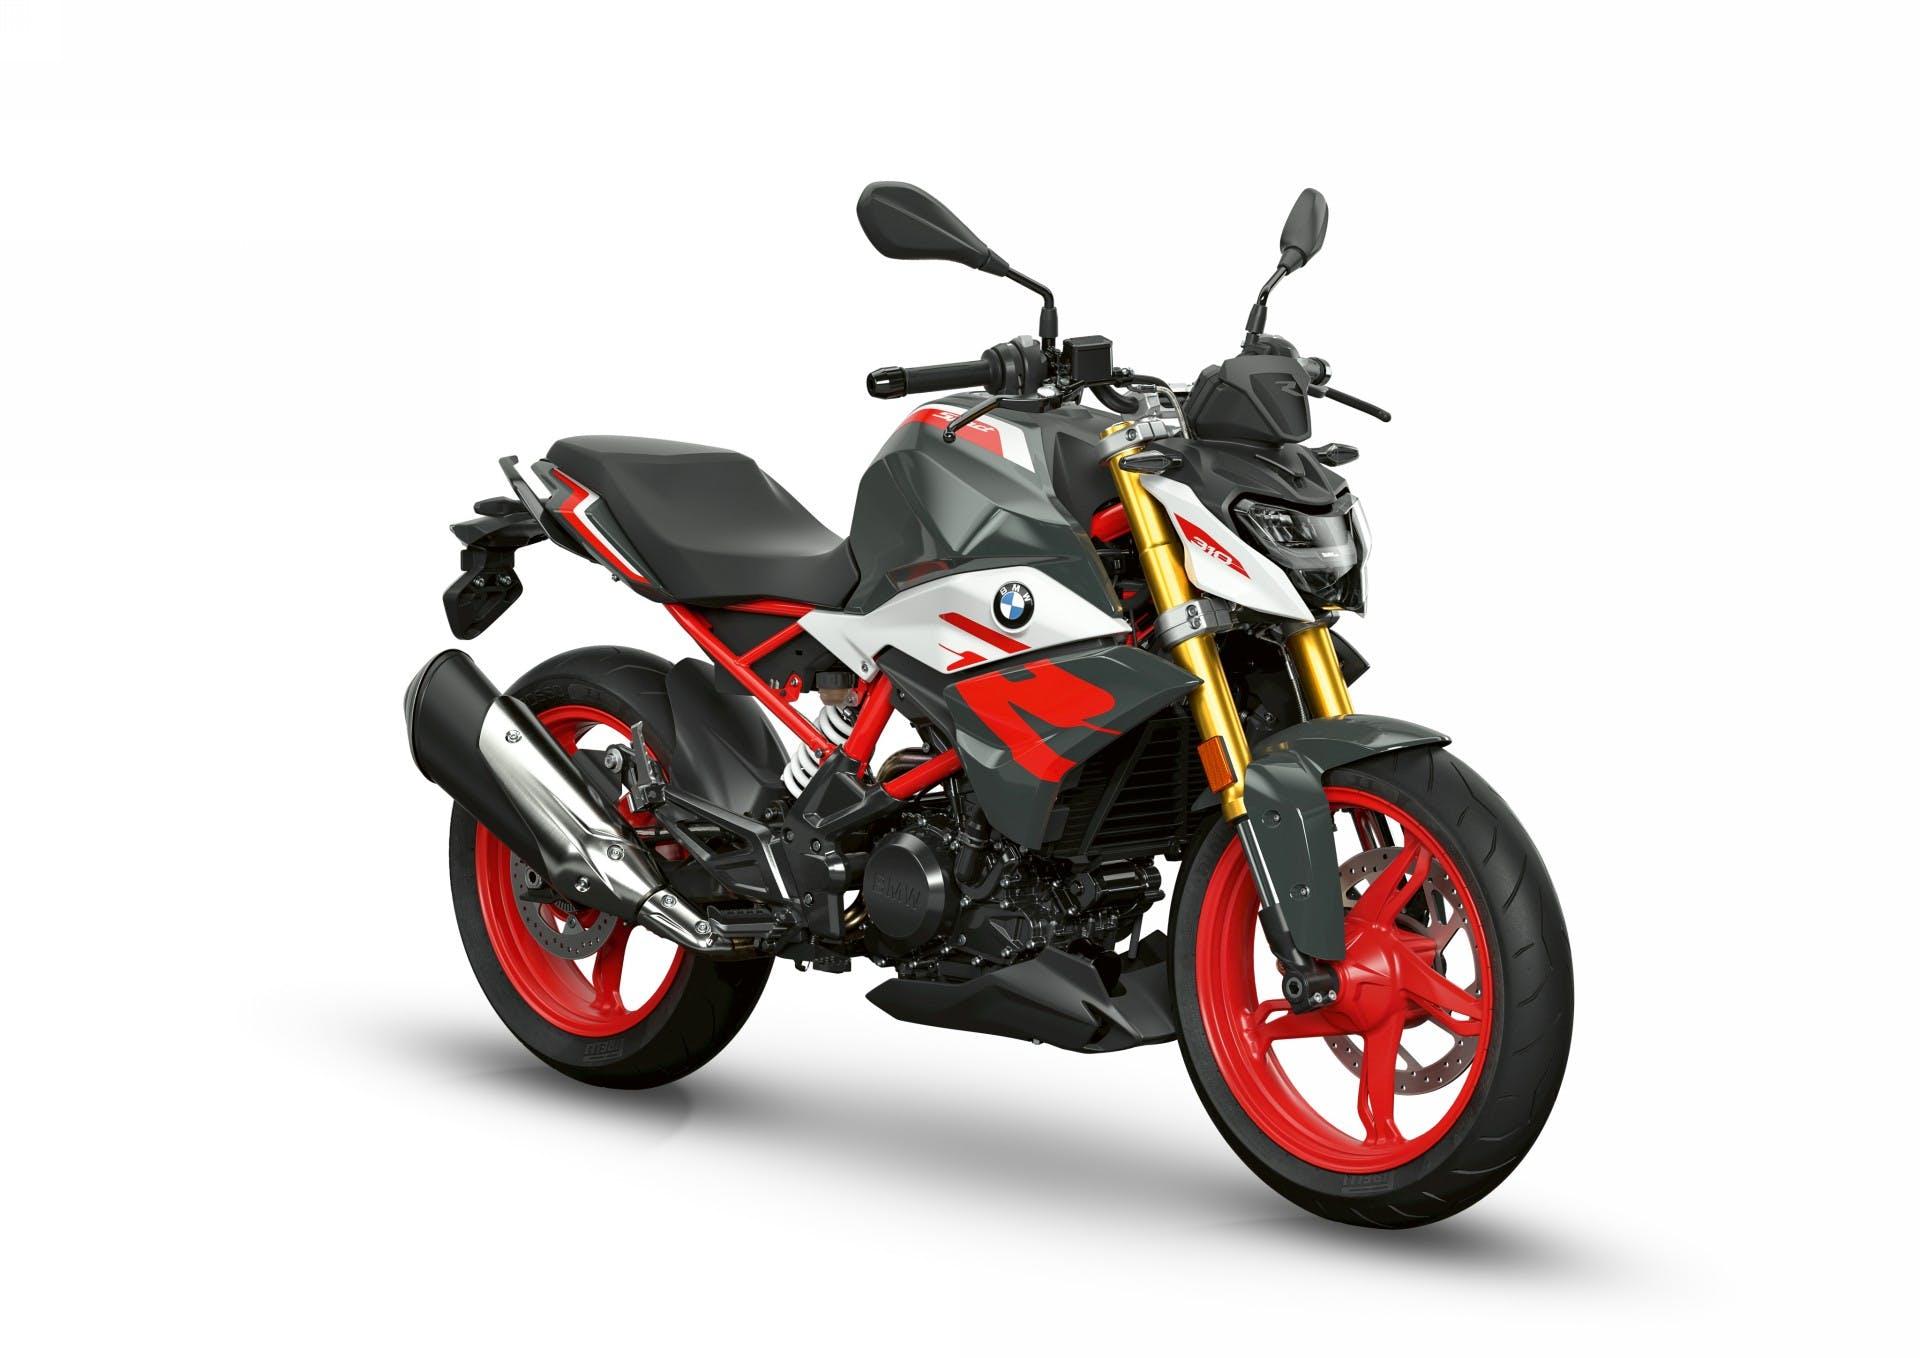 BME G 310 R 2021 migliori moto per neopatentati A2